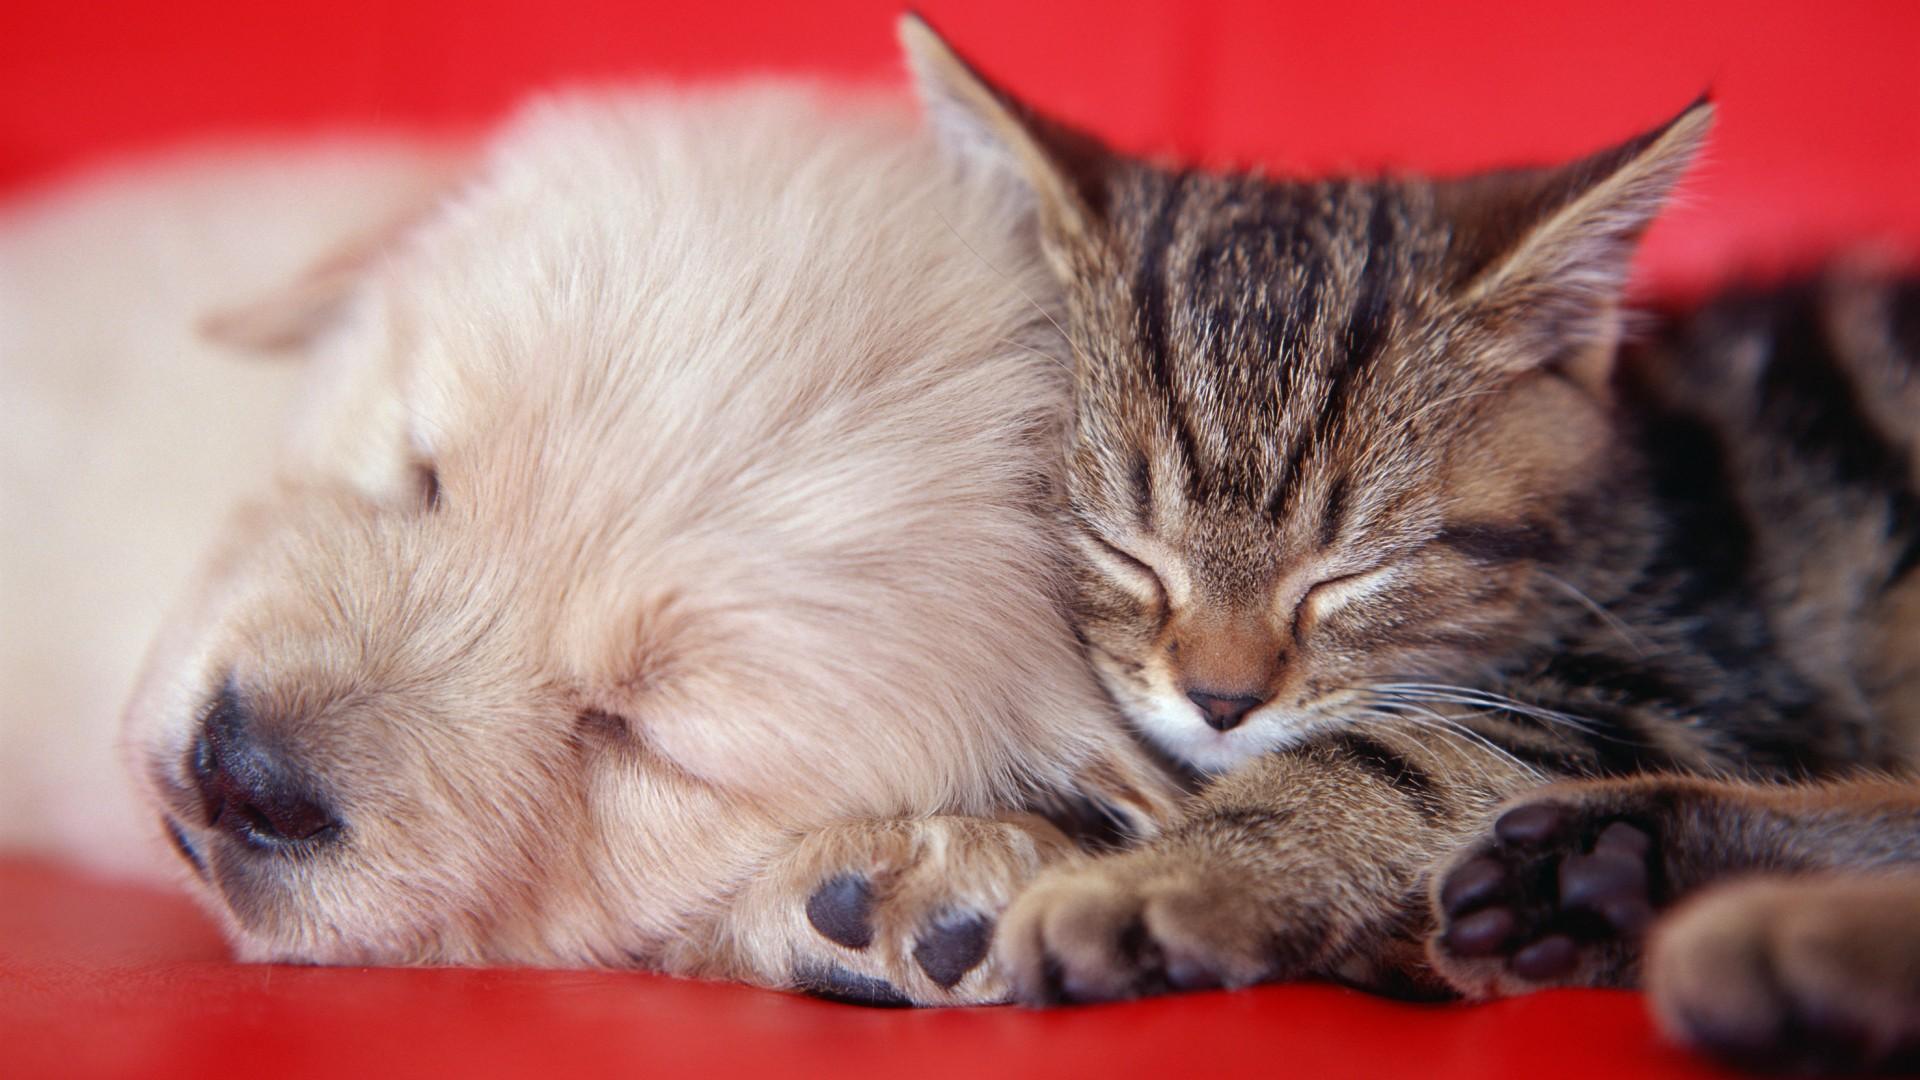 Animals cats kittens dogs puupy cute wallpaper 1920x1080 40503 1920x1080